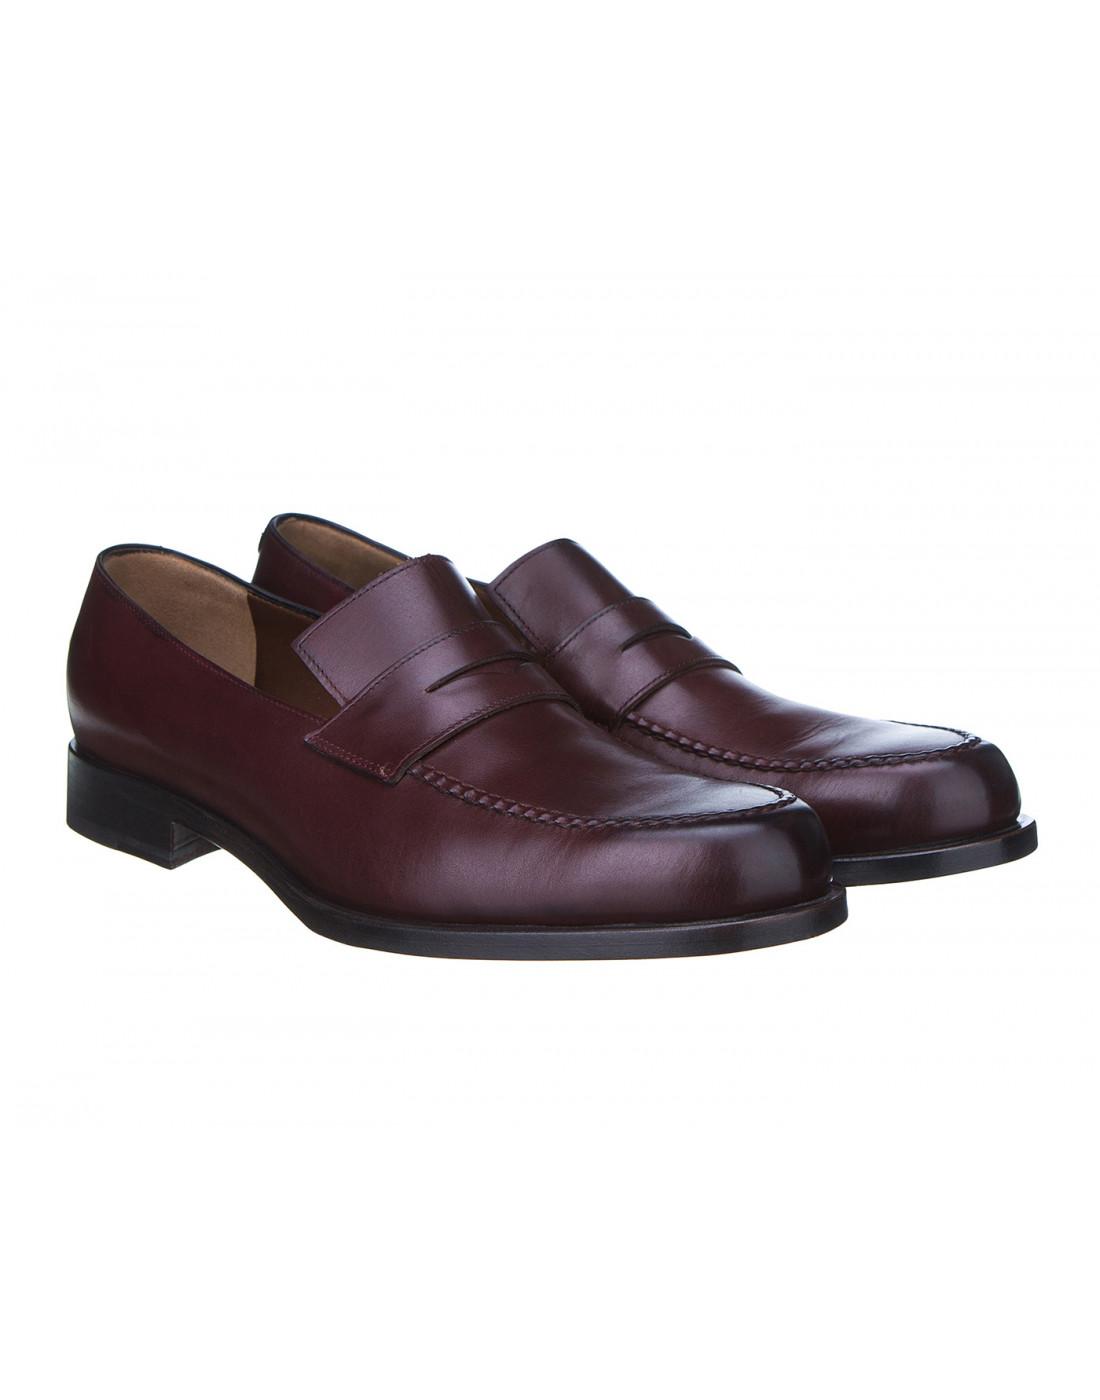 Туфли коричневые мужские Fratelli Rossetti S12597-2